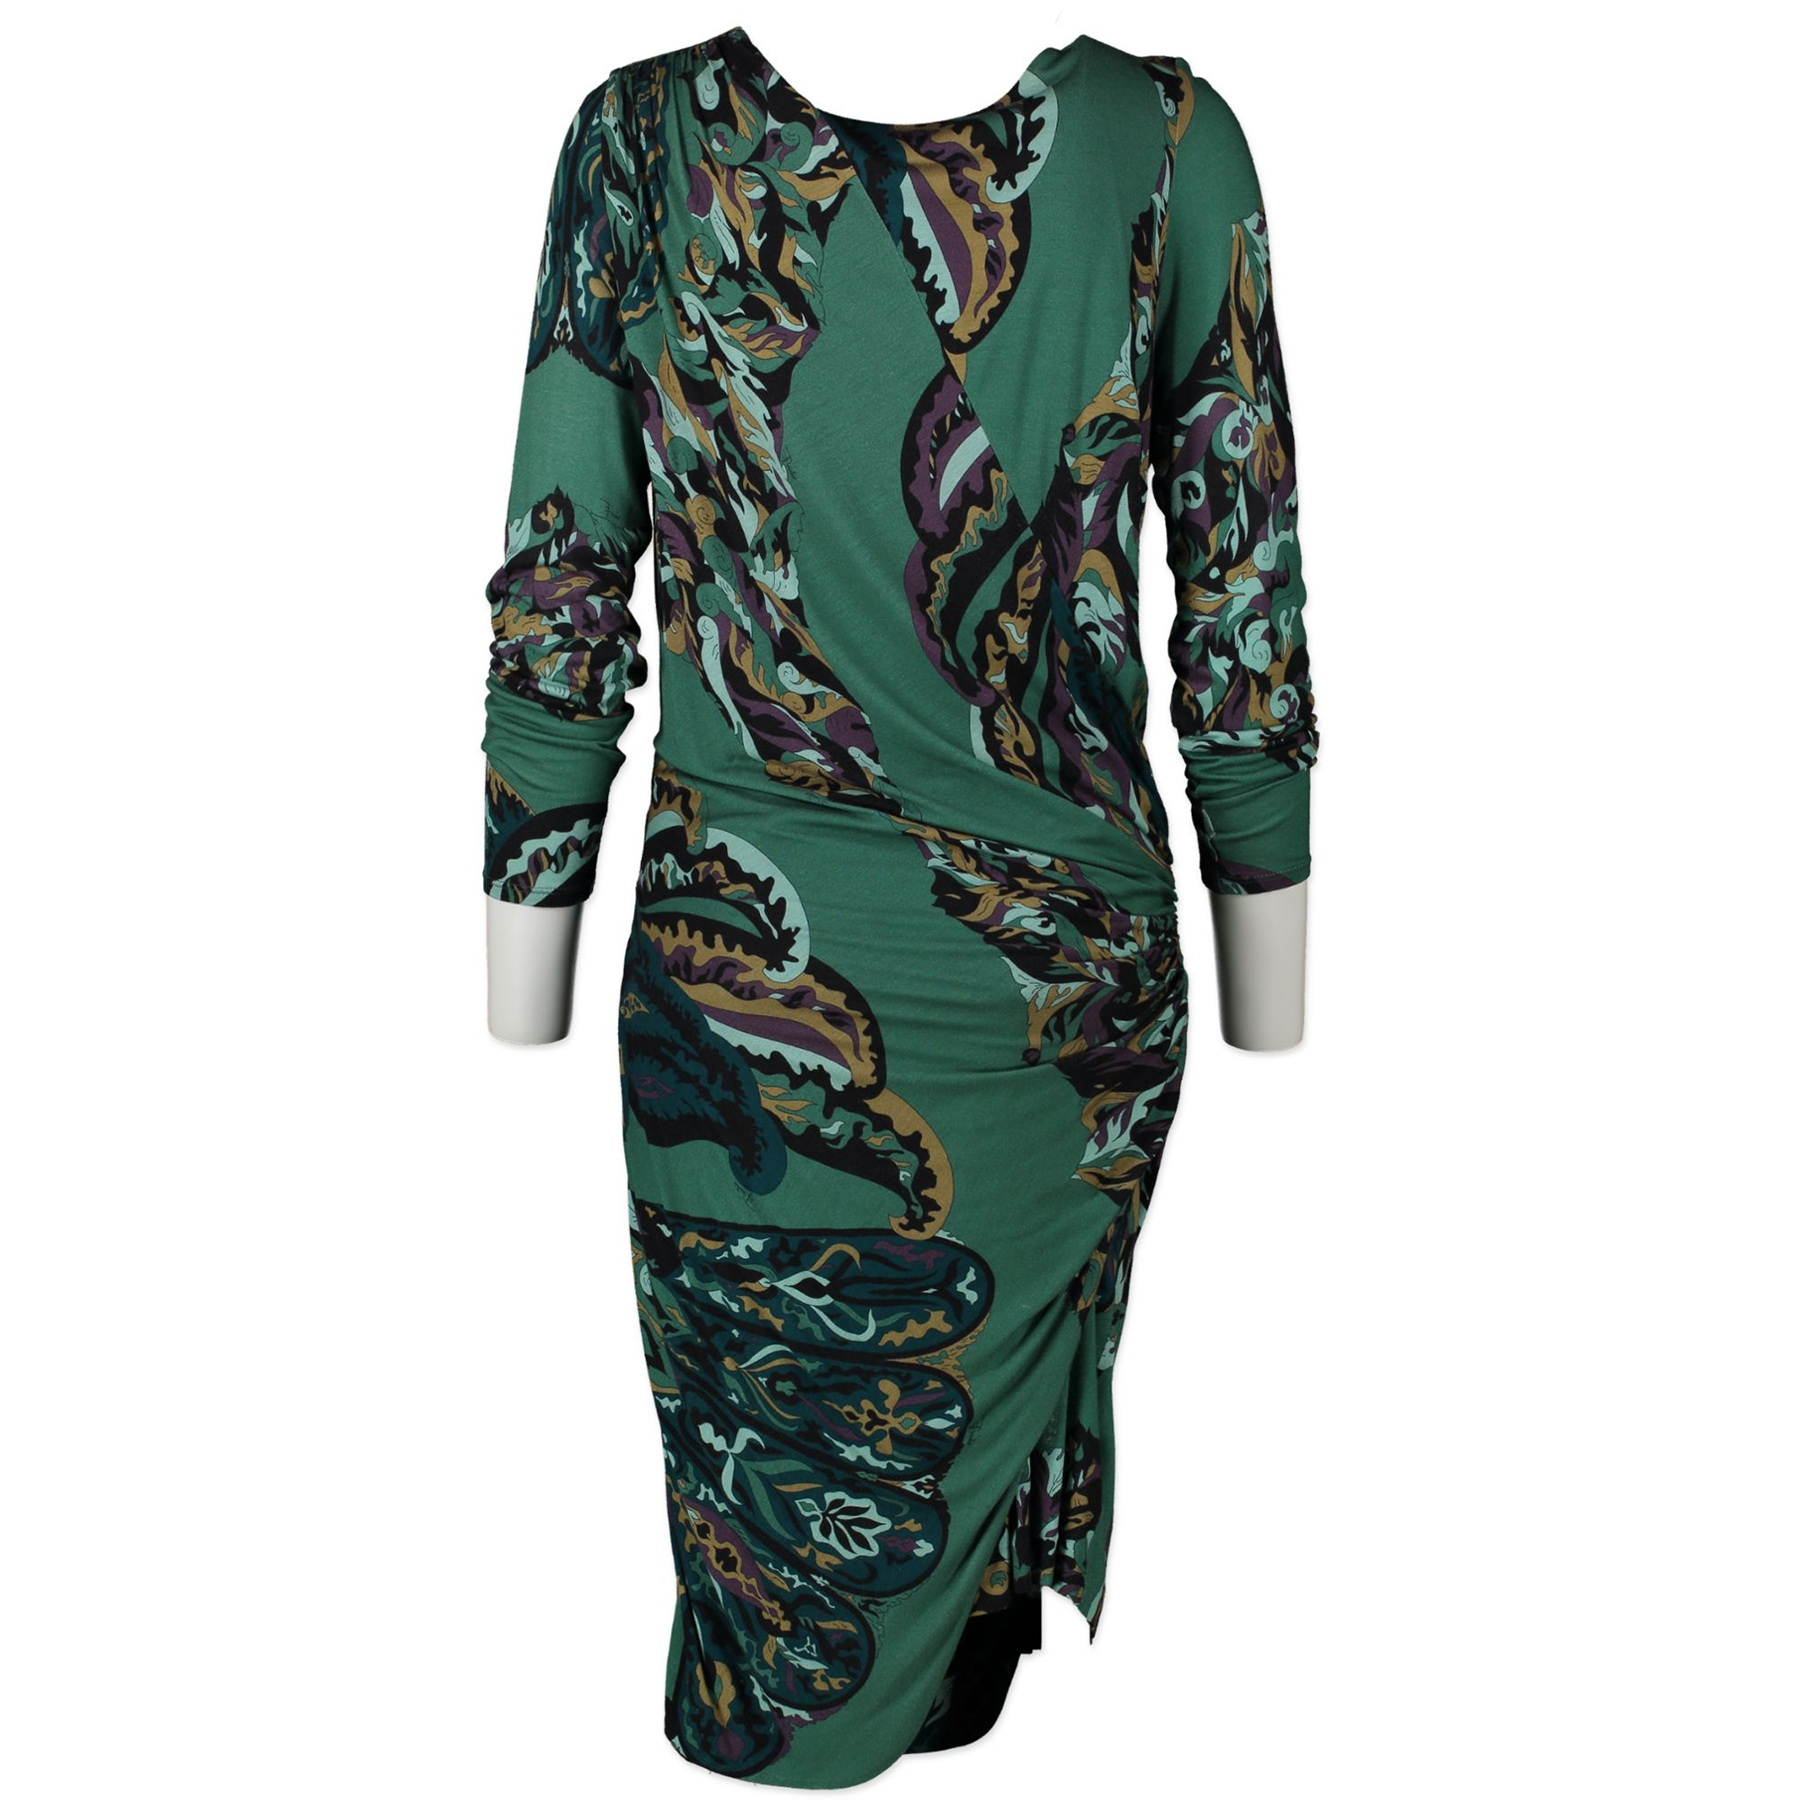 Authentieke Tweedehands Pucci Green Blue Wrap Dress - Size 42 juiste prijs veilig online shoppen luxe merken webshop winkelen Antwerpen België mode fashion wrap jurken kleedjes